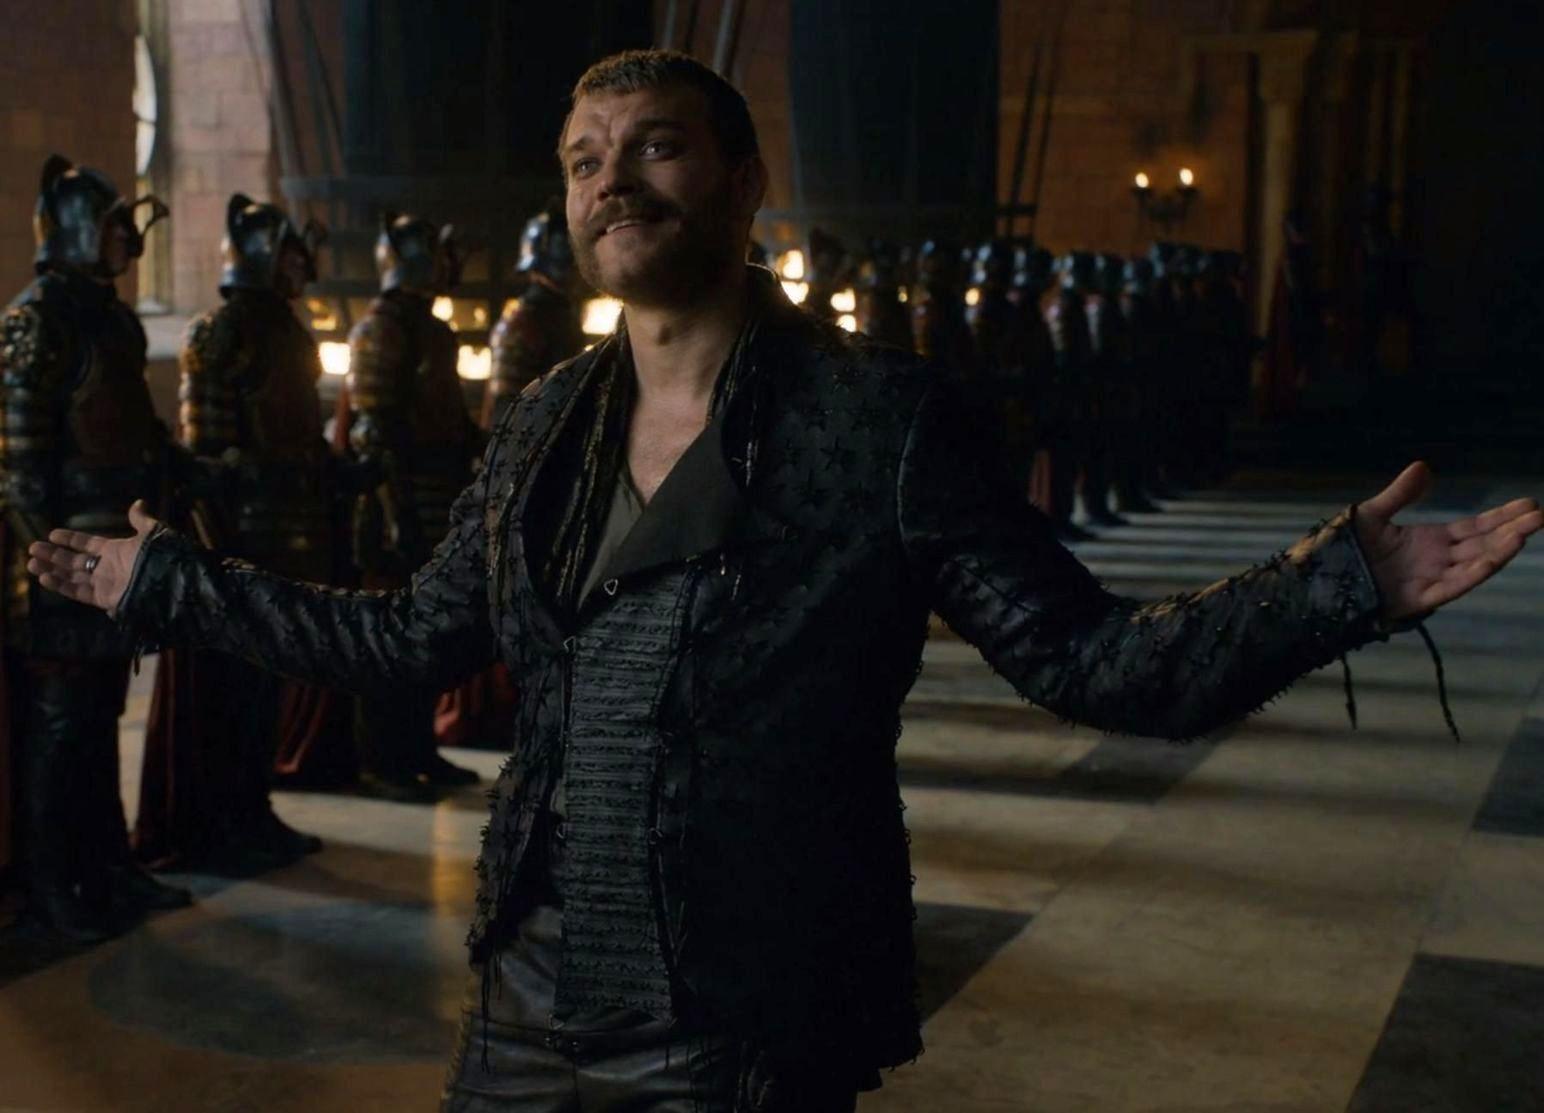 Game Of Thrones Season 7 Episode 4 Subtitles English 720p